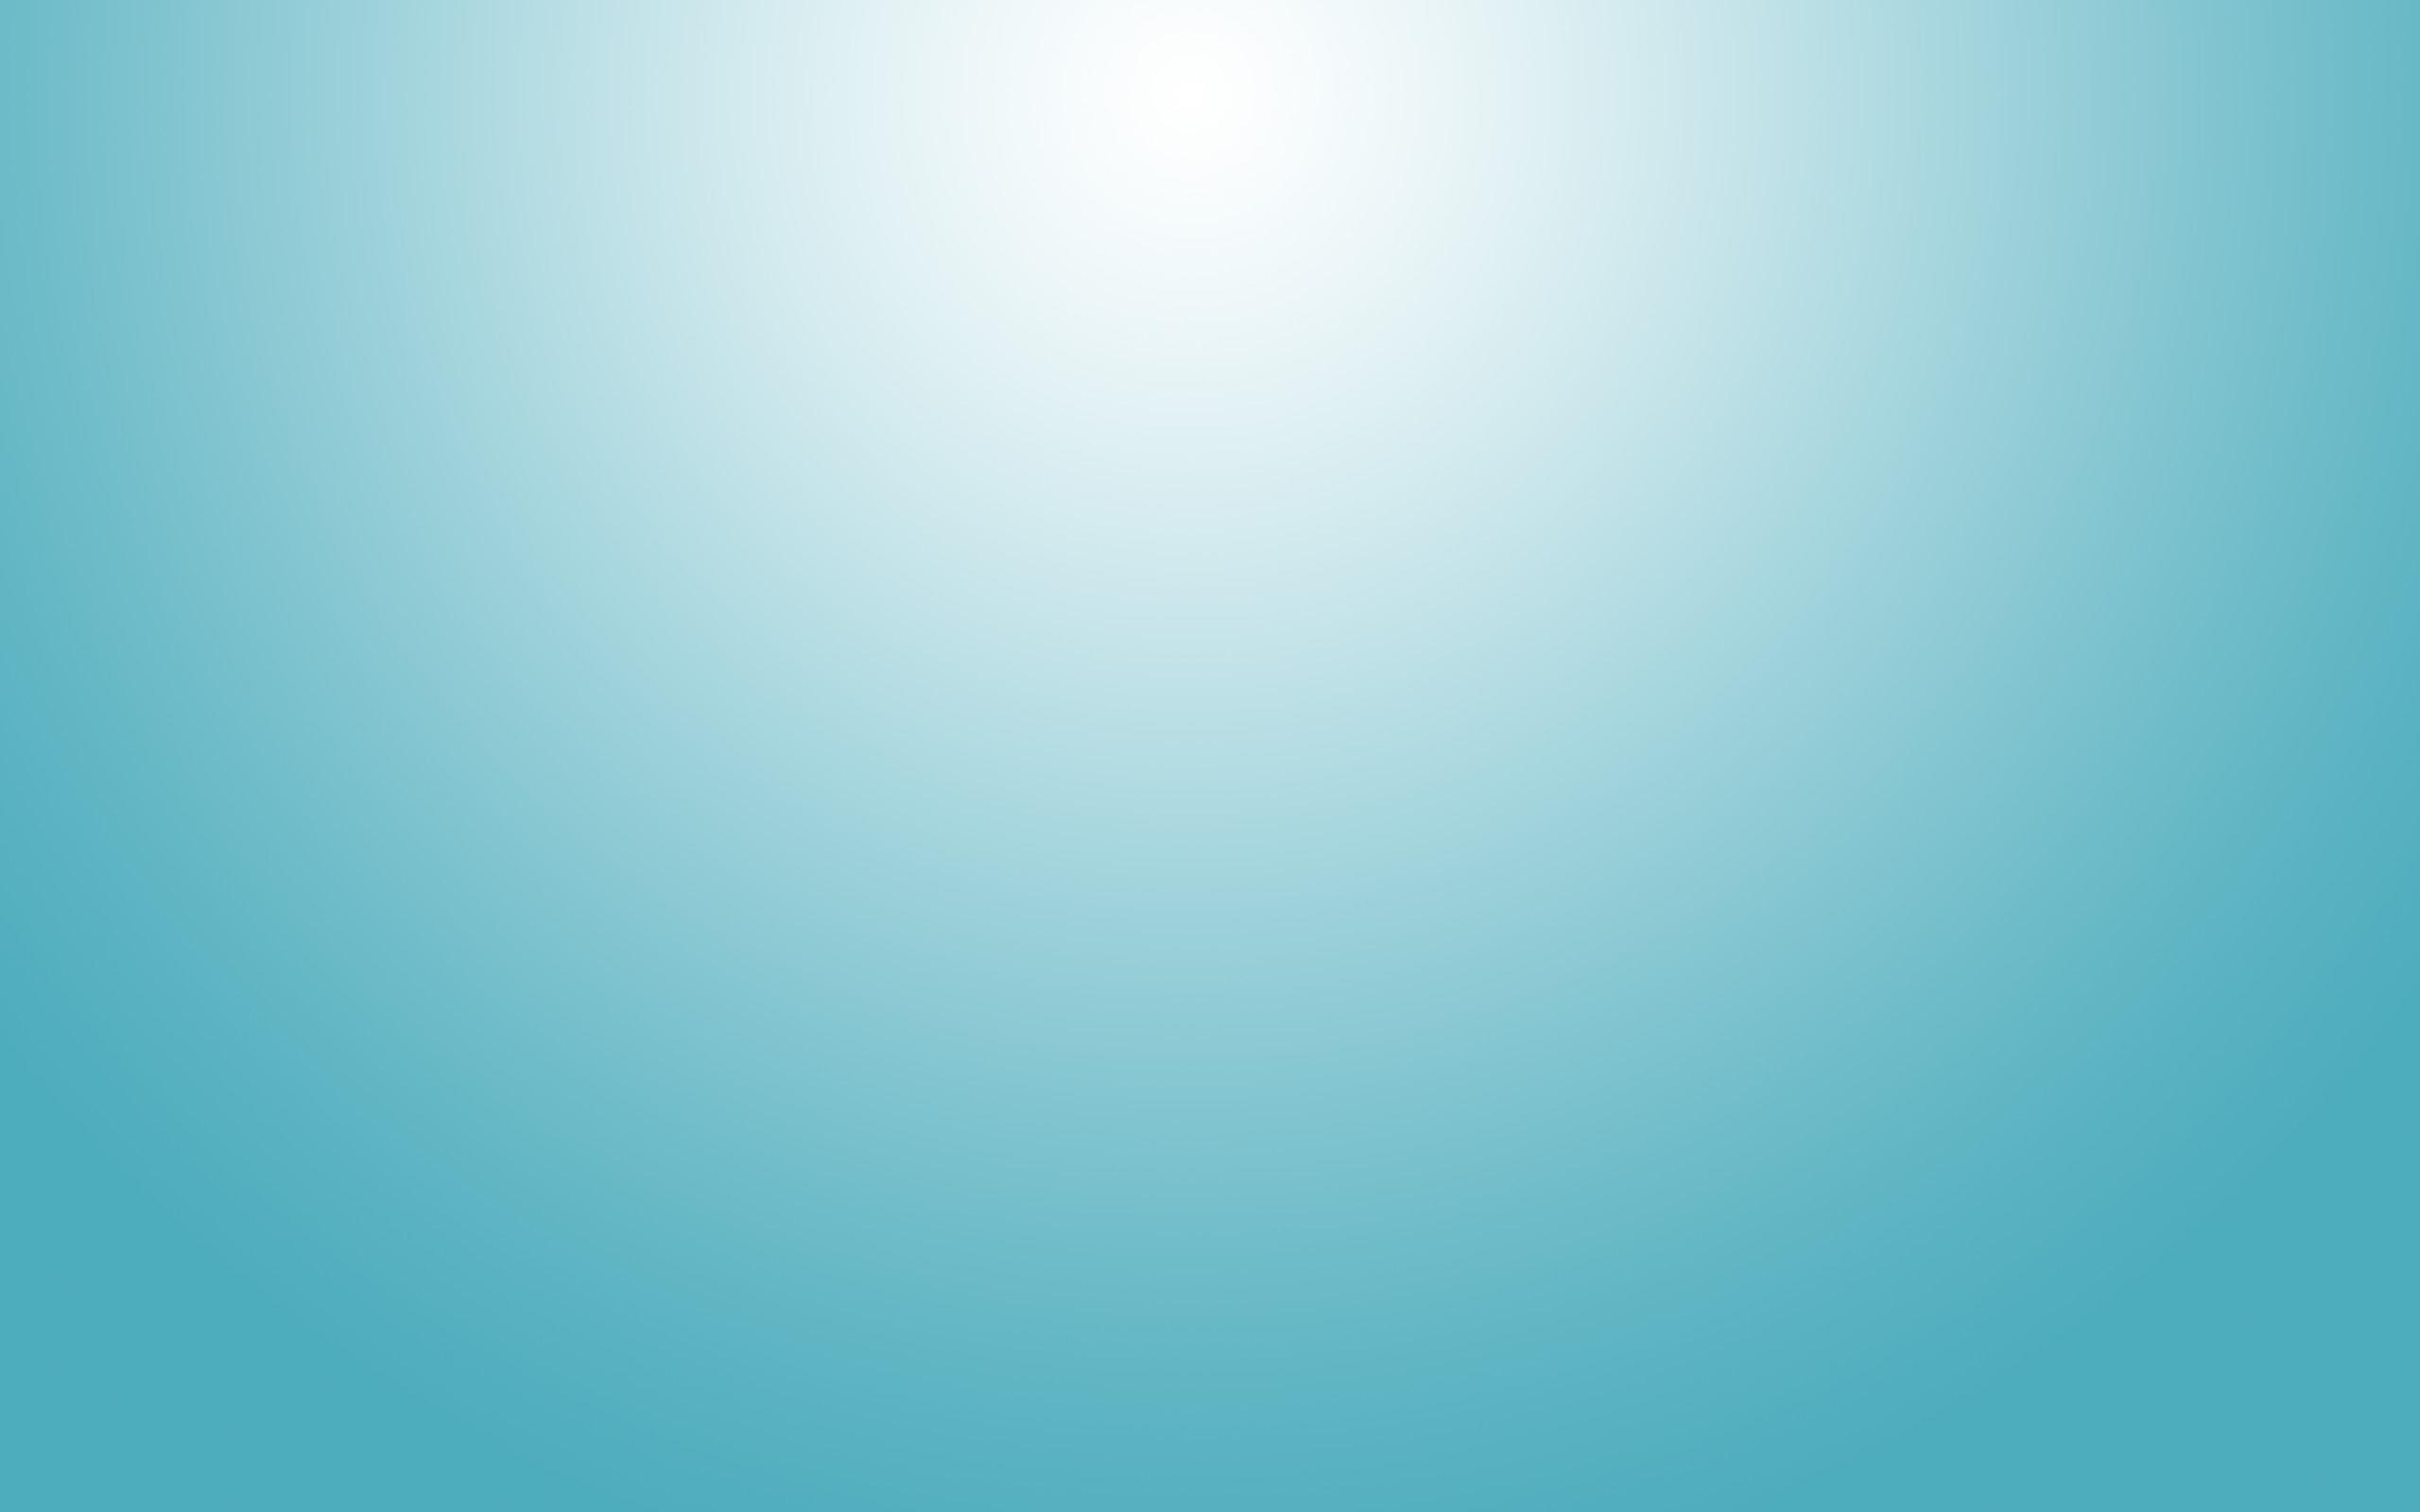 light blue gradient wallpaper 21319